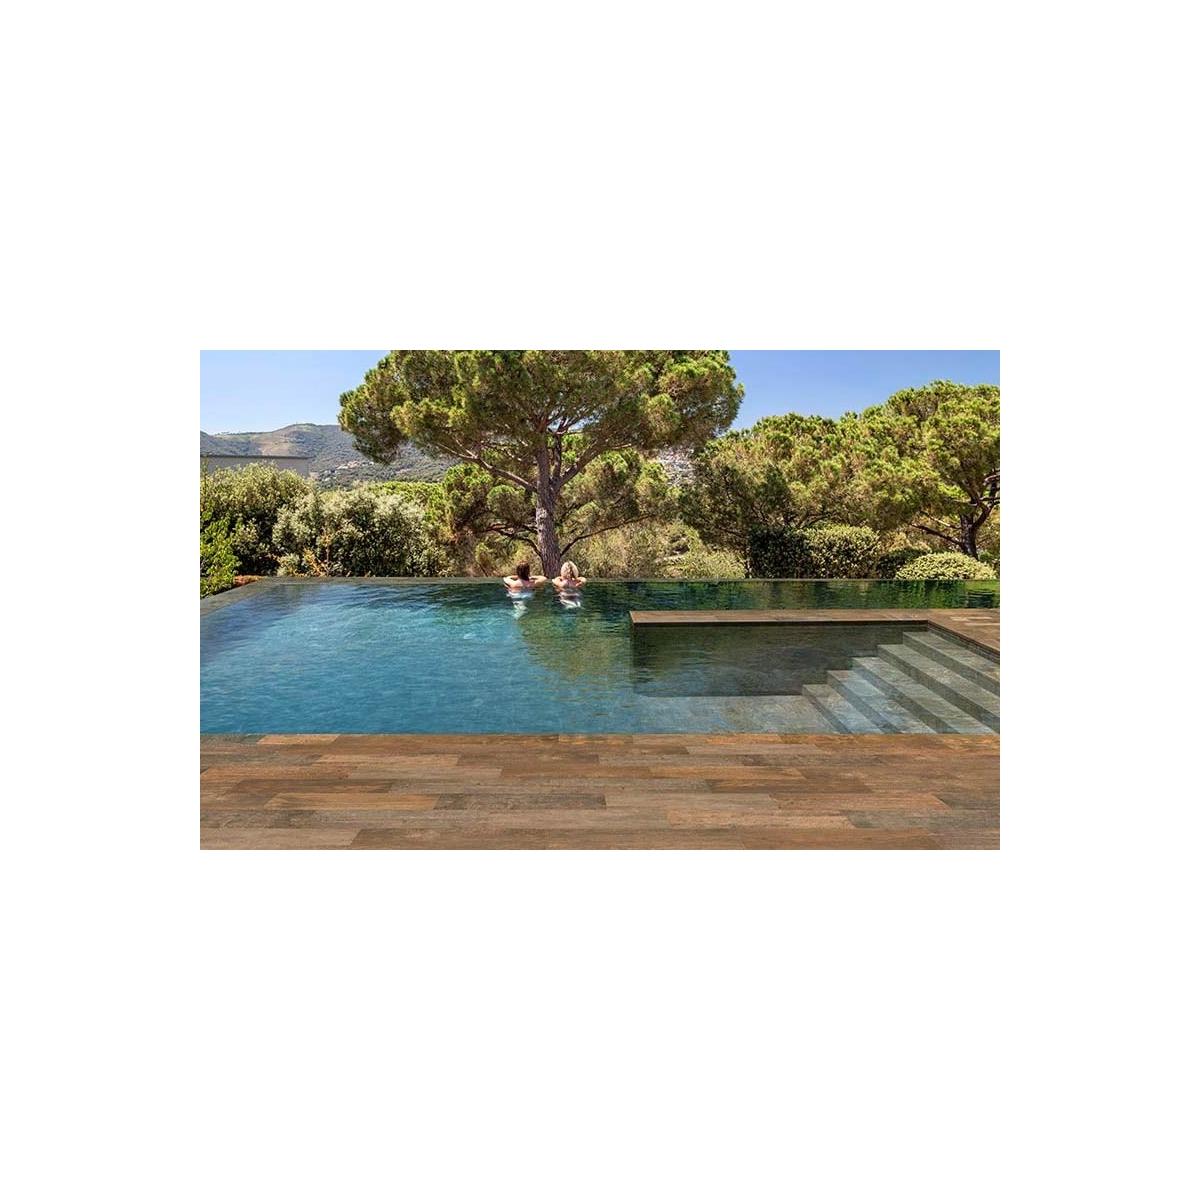 Borde de piscina recto Stela Dark L62 62,6x31,7x3,8 Rosagres